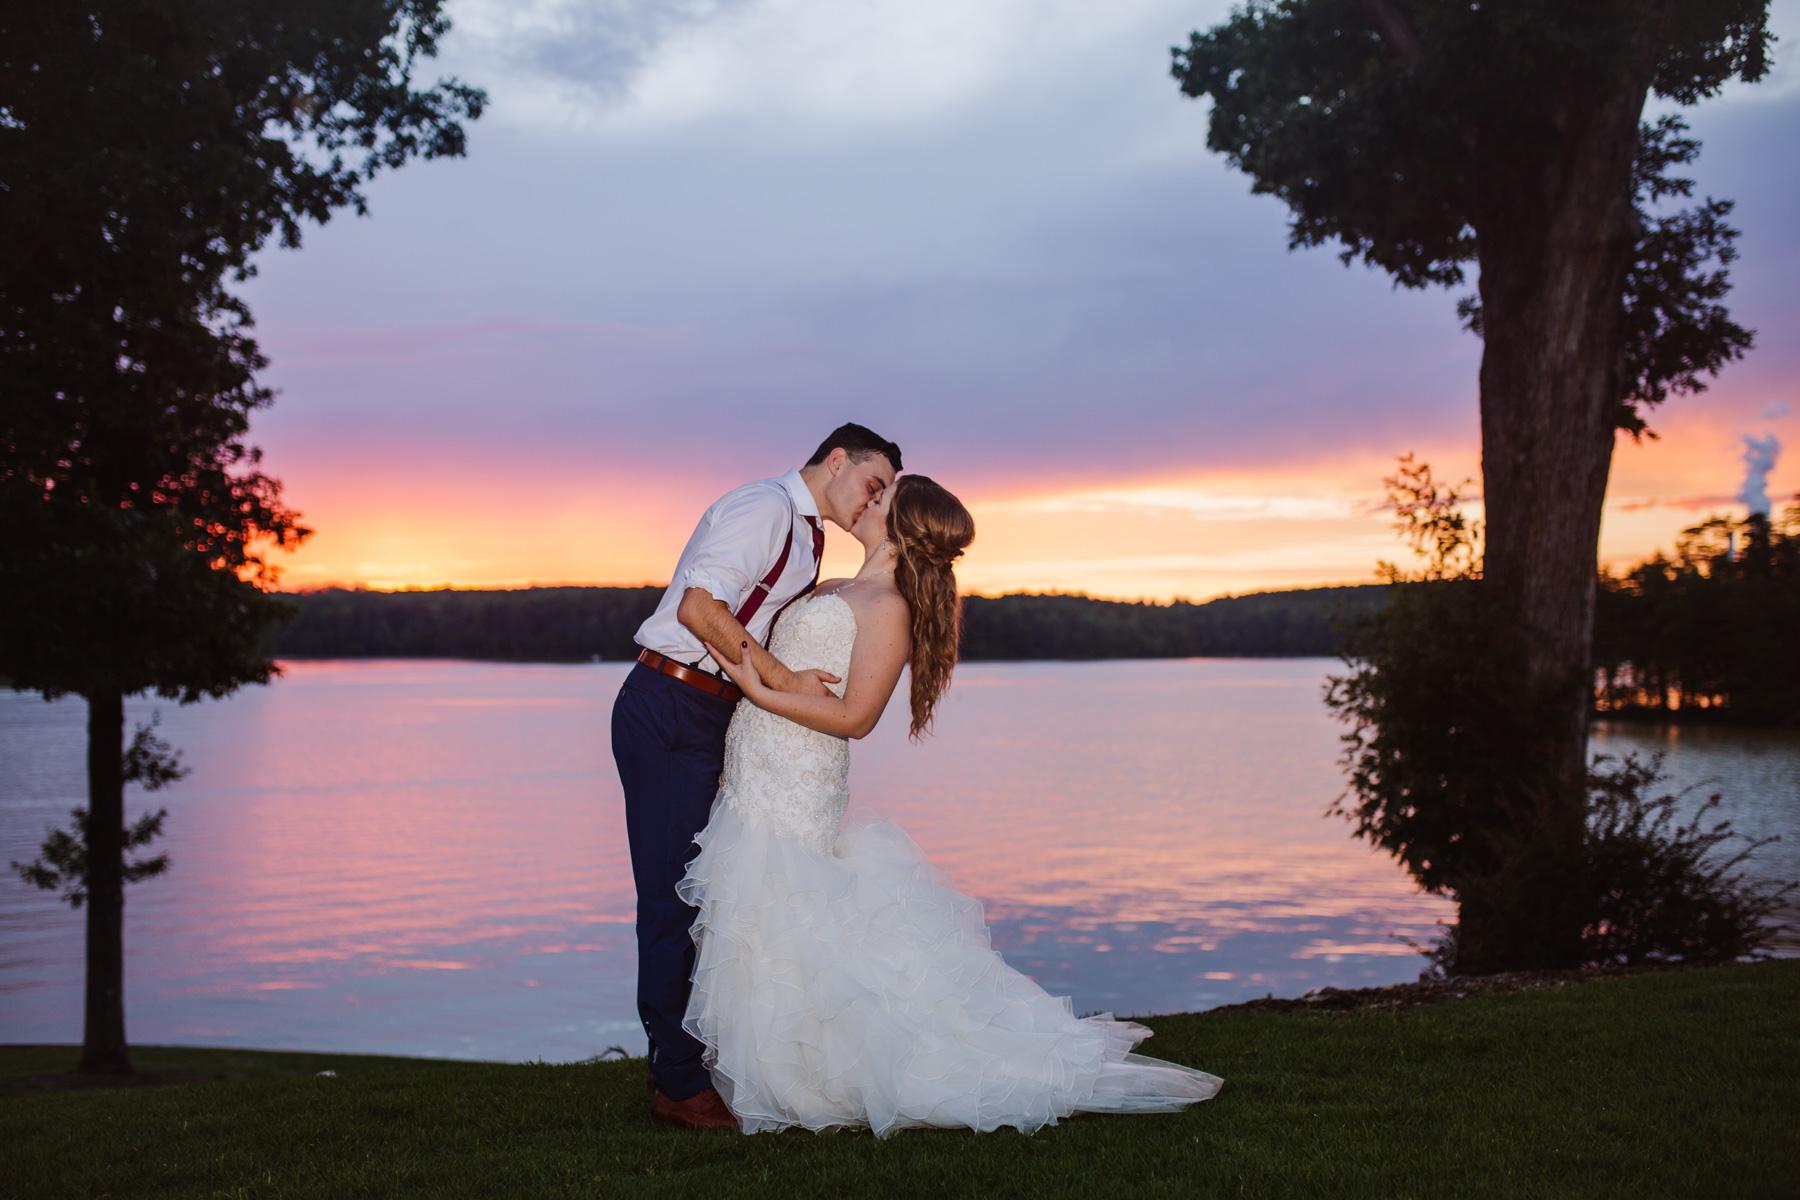 Romantic Sunset portraits of Bride and Groom at Bella Collina | Kayli LaFon Photography